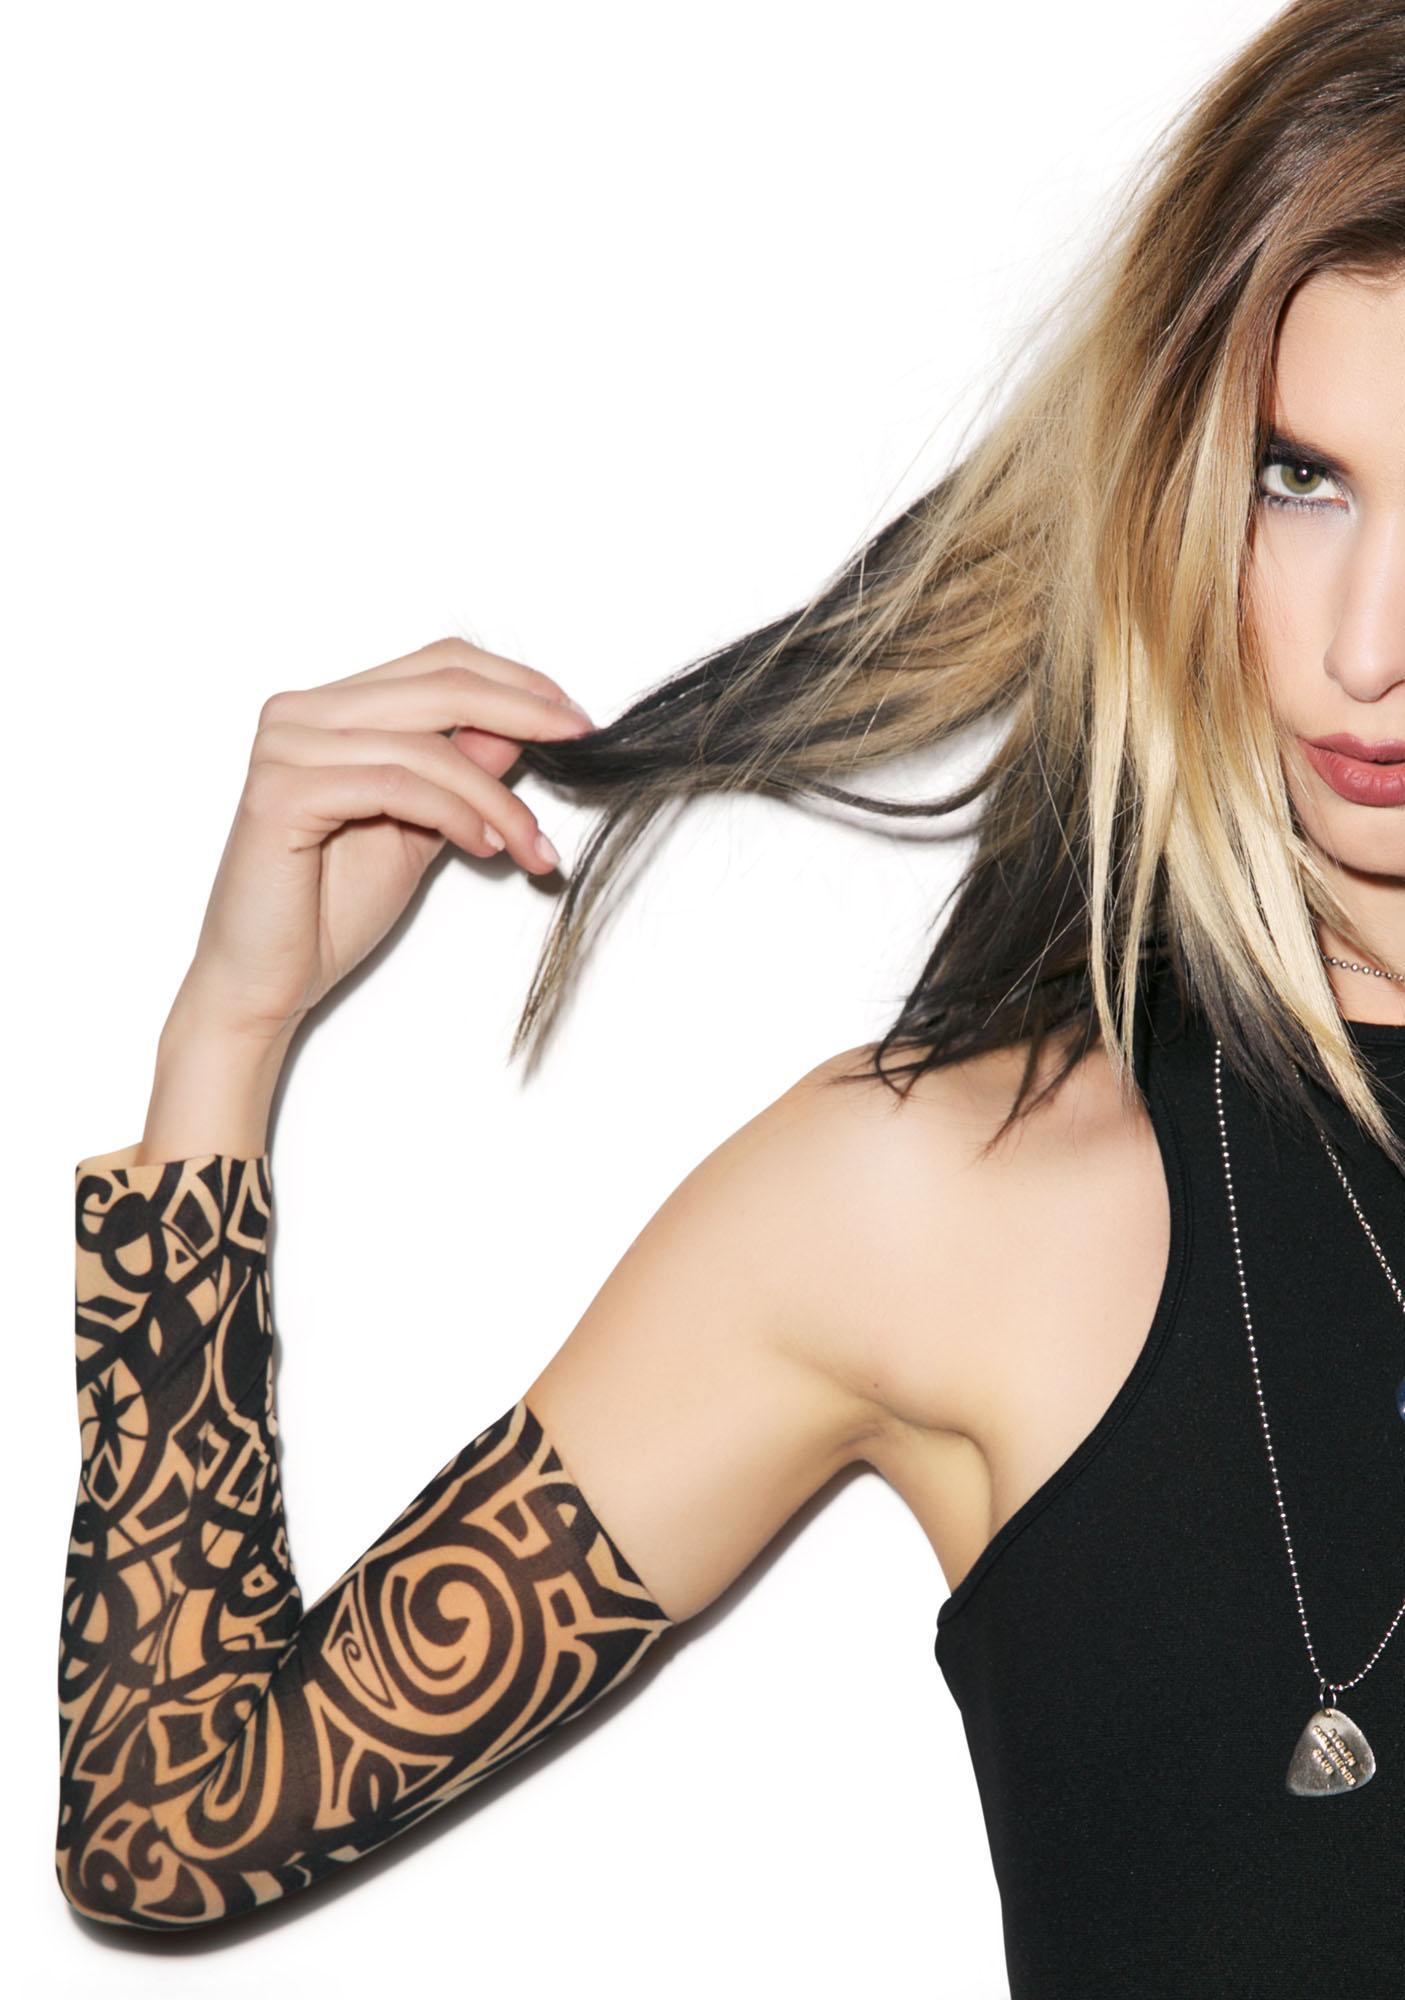 Goin' Tribal Tattoo Sleeves